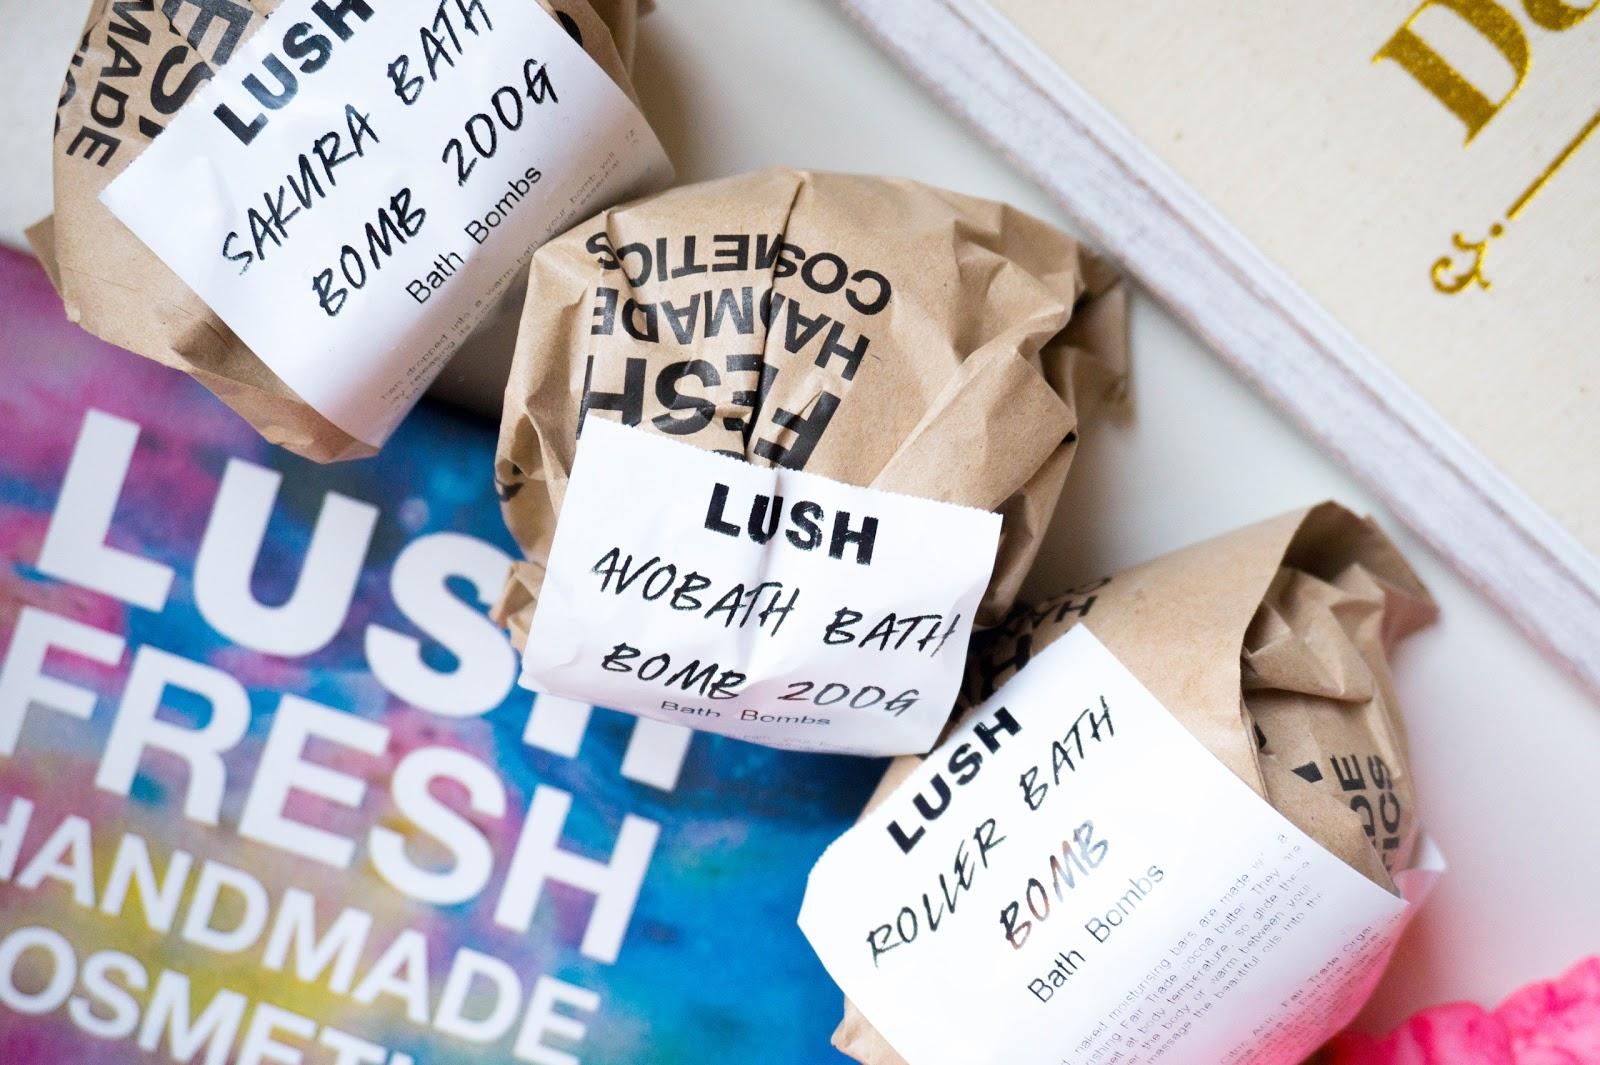 Lush Oxford Street